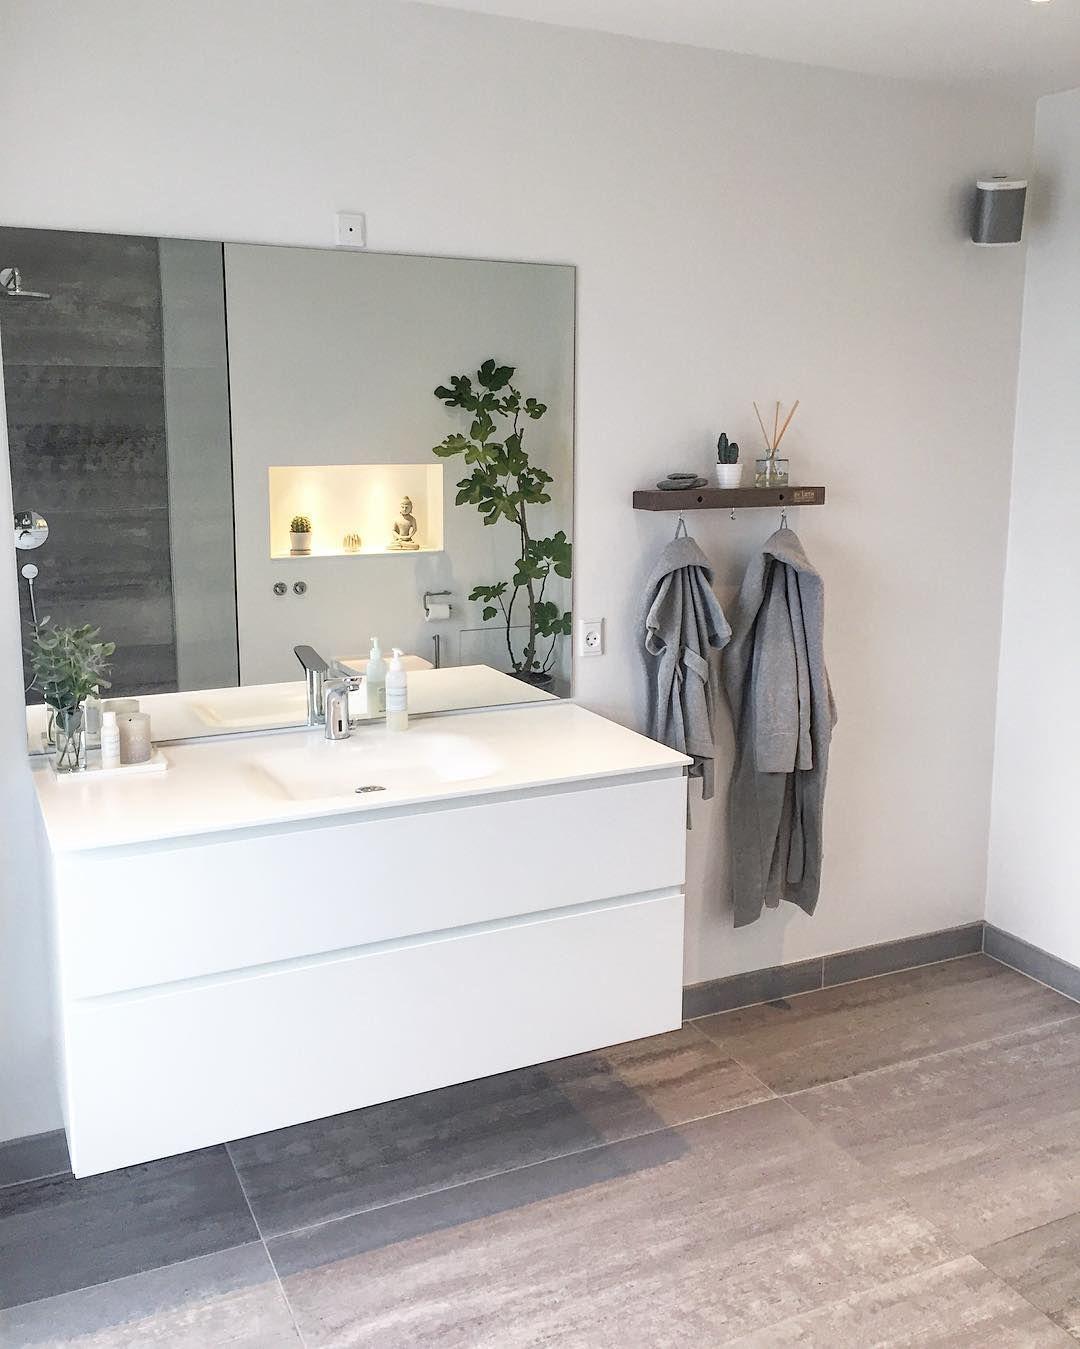 Walcut Usbr1031 Badezimmer Wandhalterung Rechteck Weiss Porzellan Keramik Waschbecken Chrom Wasserhahn Decor Home Home Decor